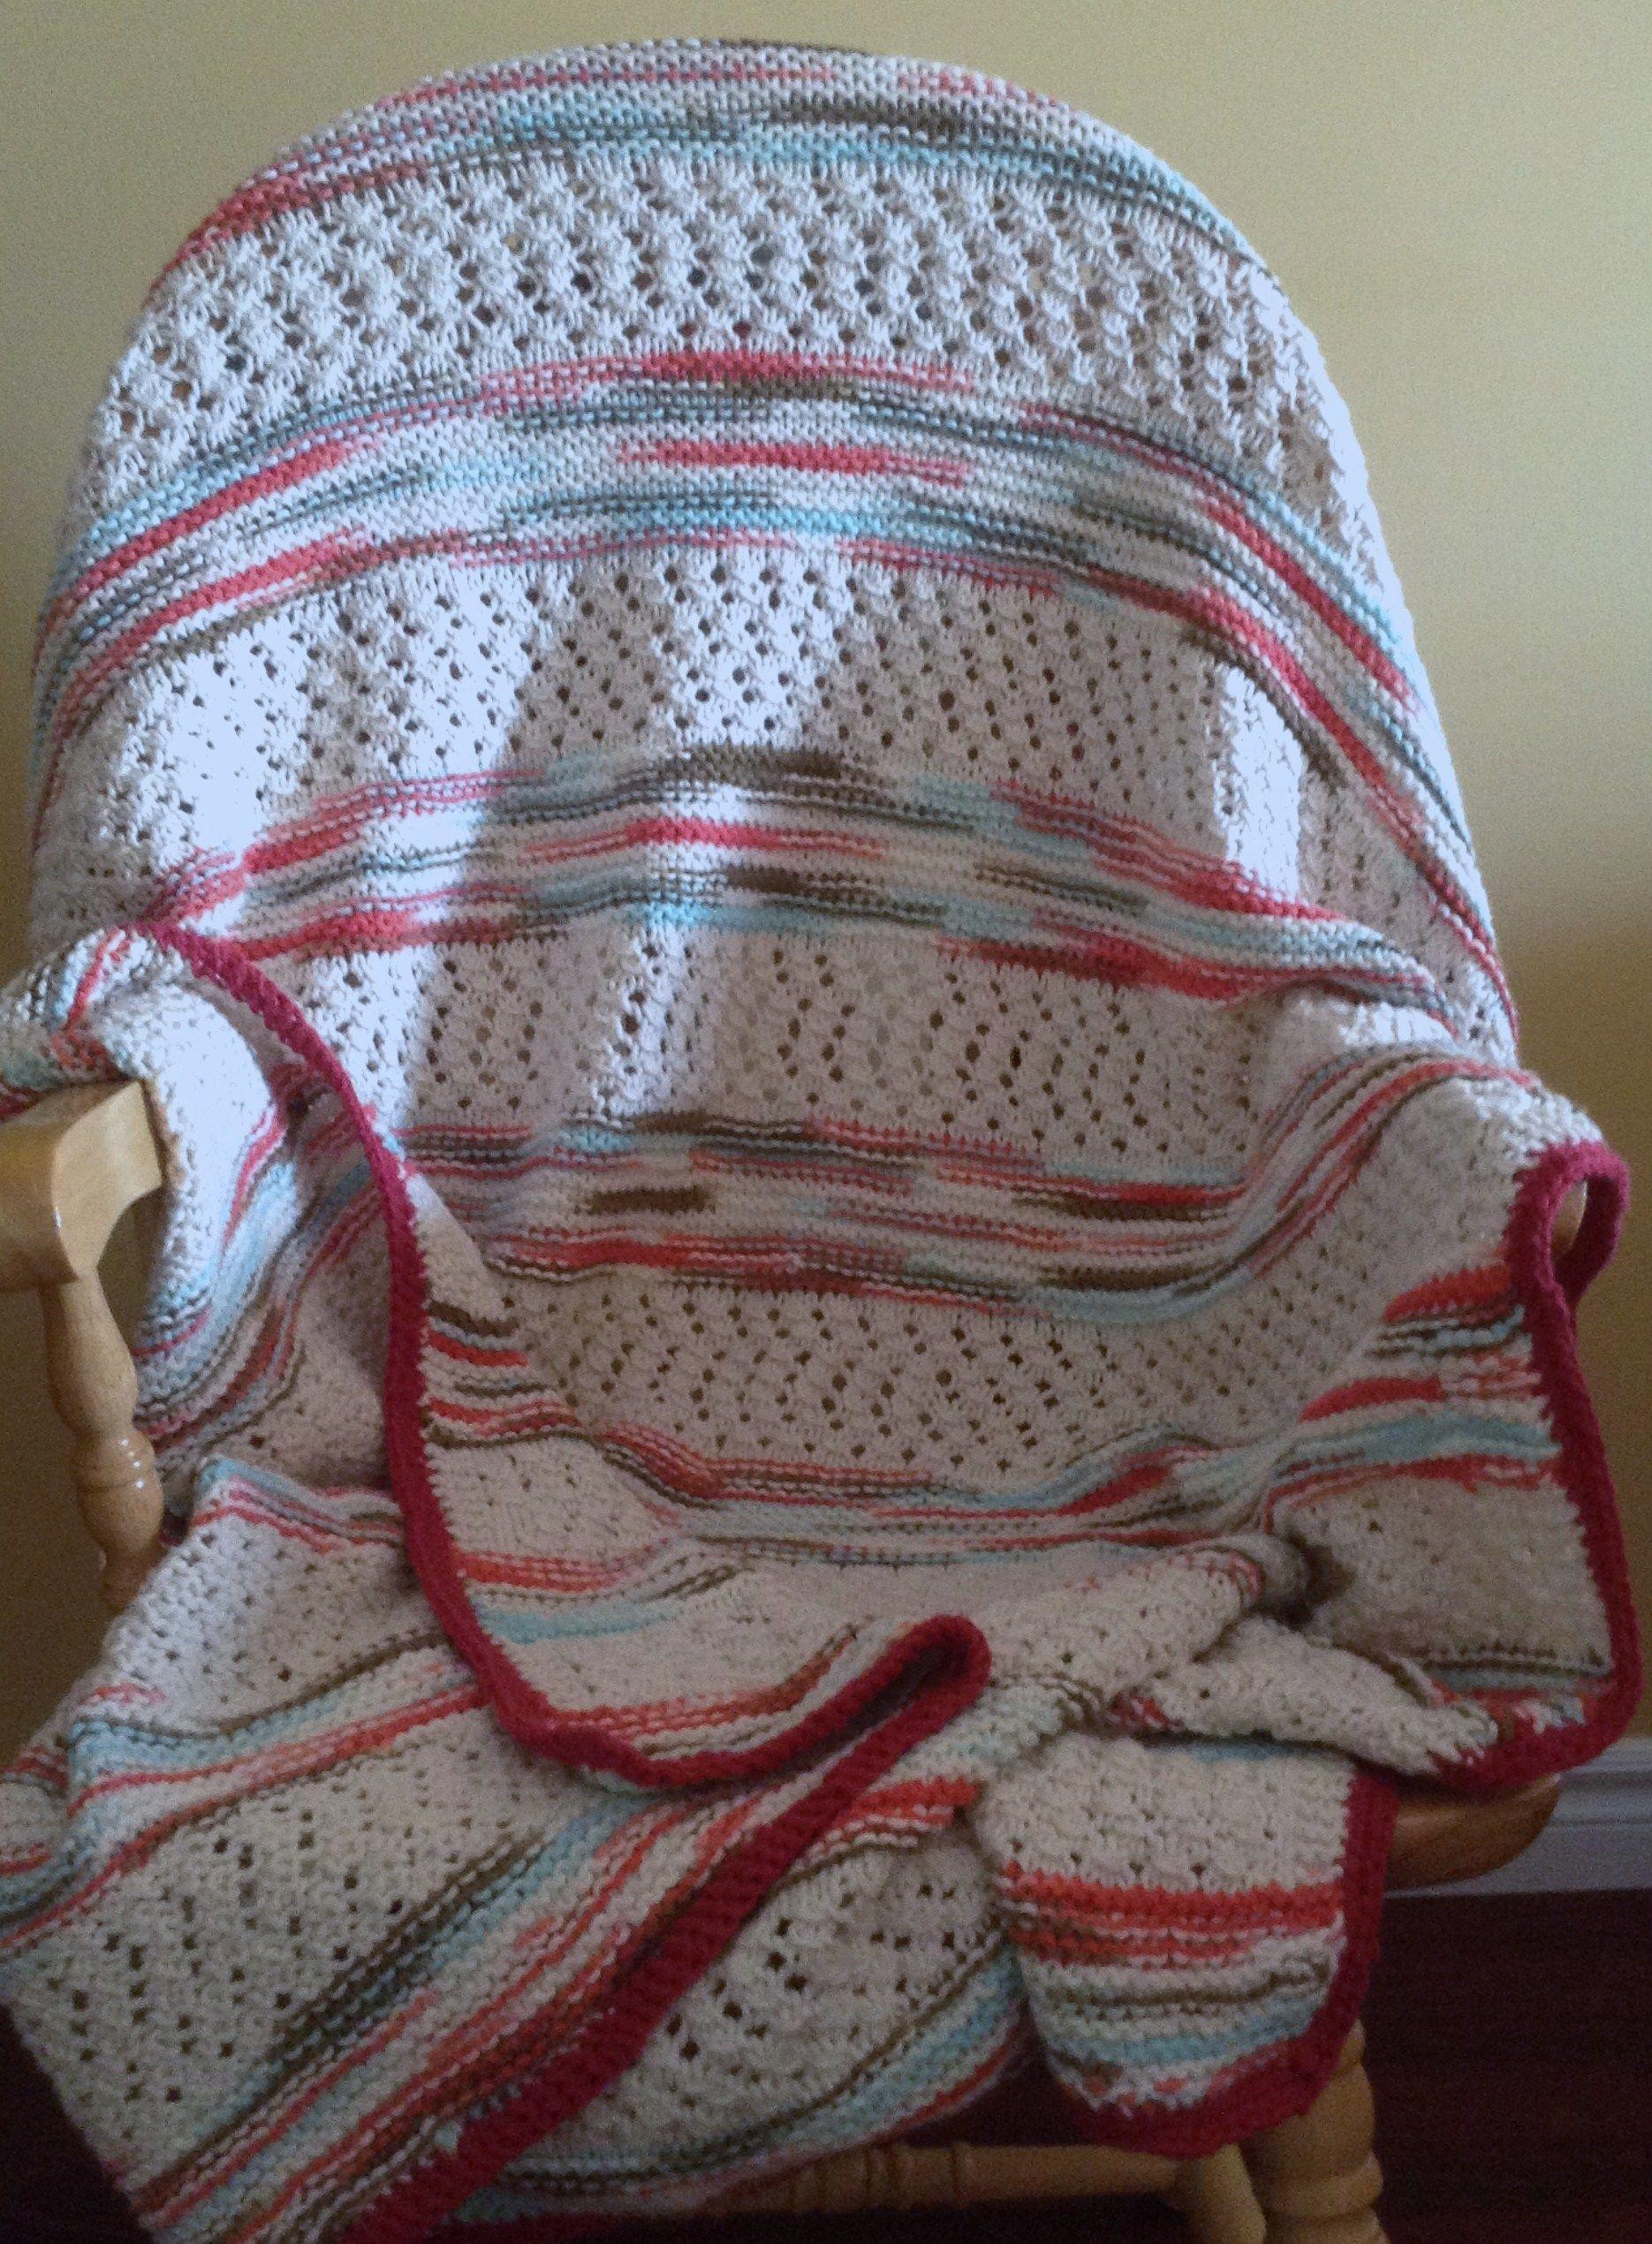 Knit Garter Stripe Blanket with crochet border. Done in Bernat ...